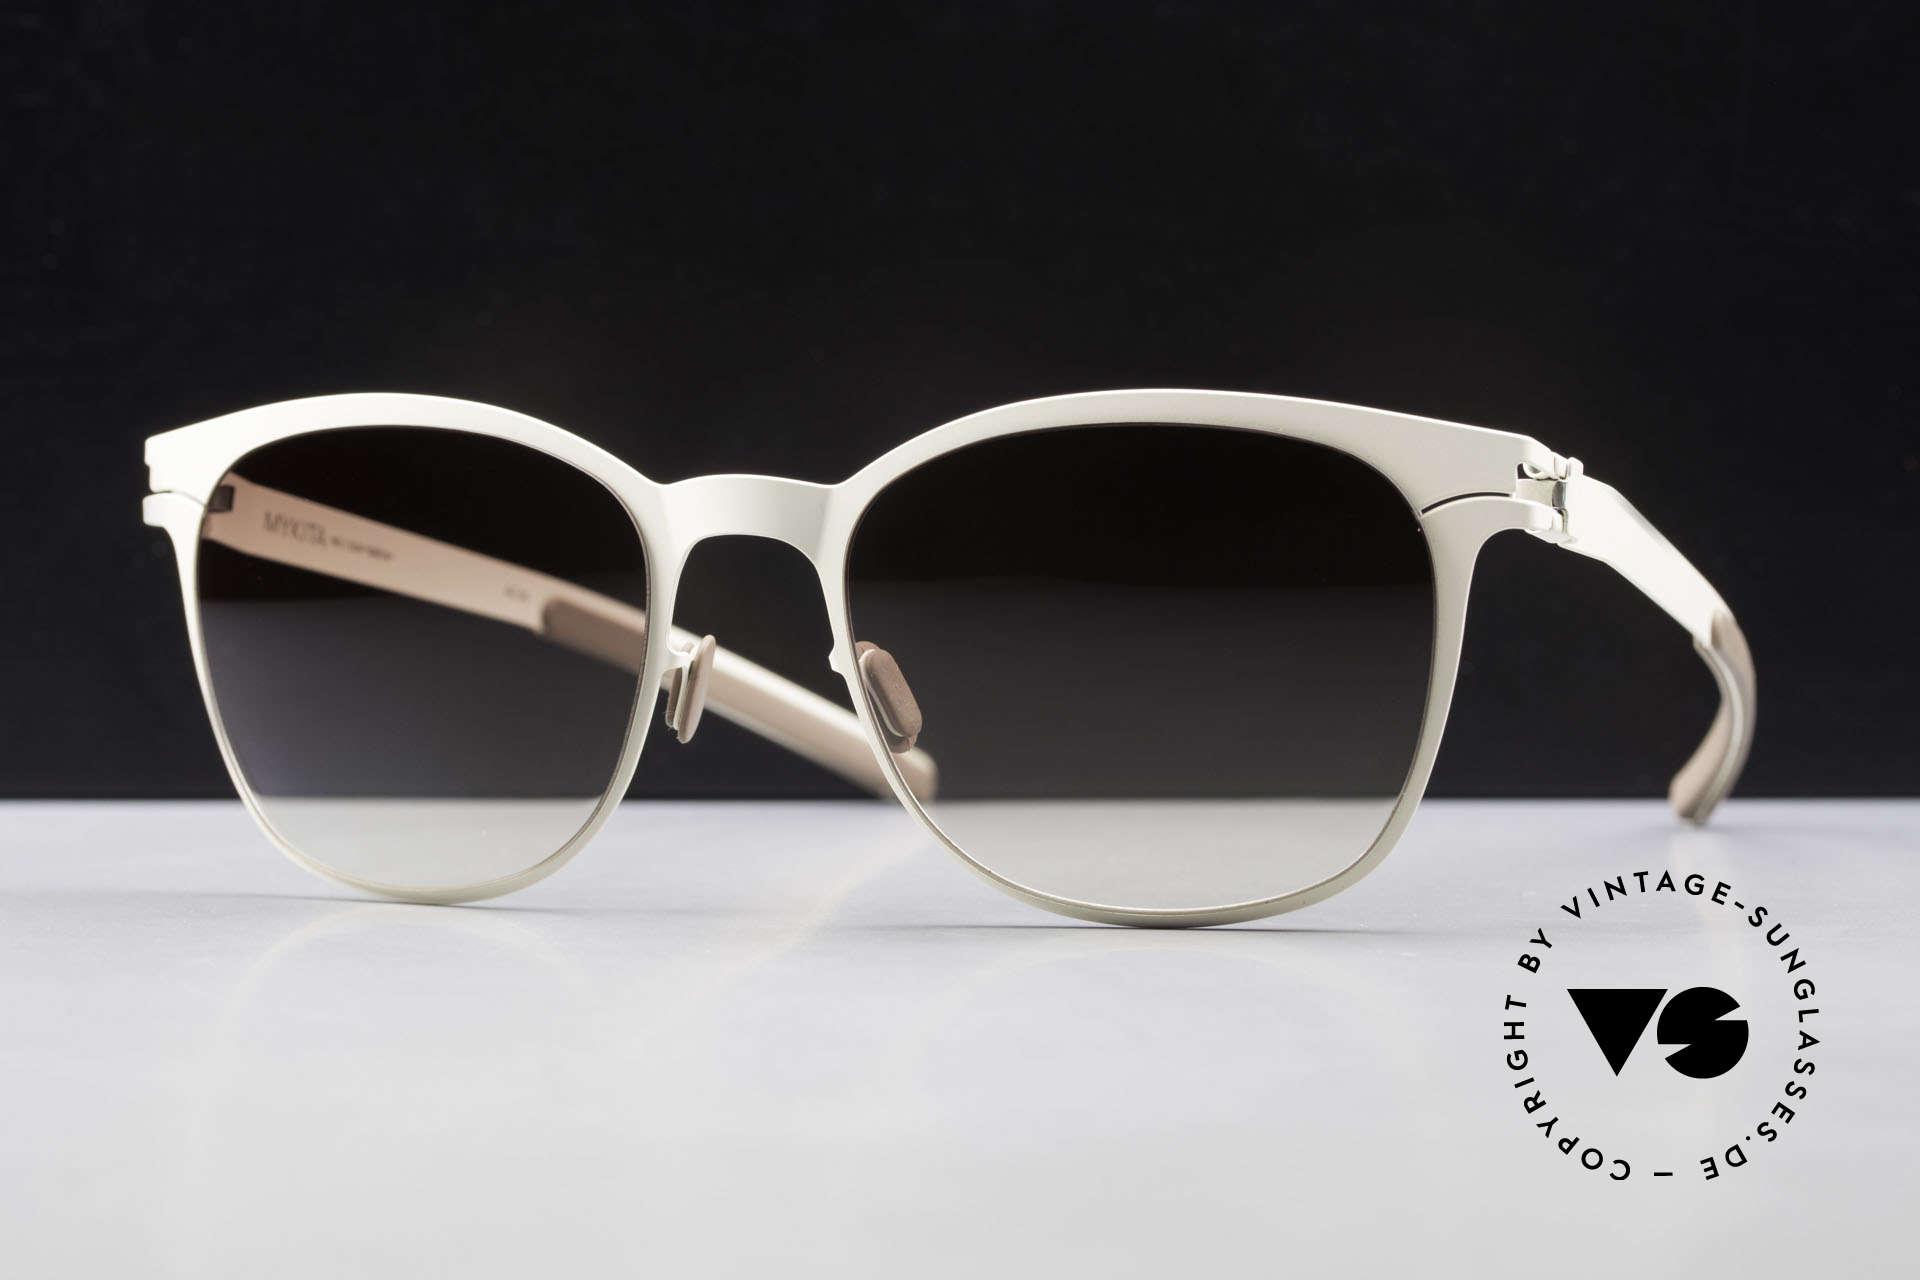 Mykita Greta Ladies Sunglasses From 2009, original VINTAGE MYKITA ladies sunglasses from 2009, Made for Women